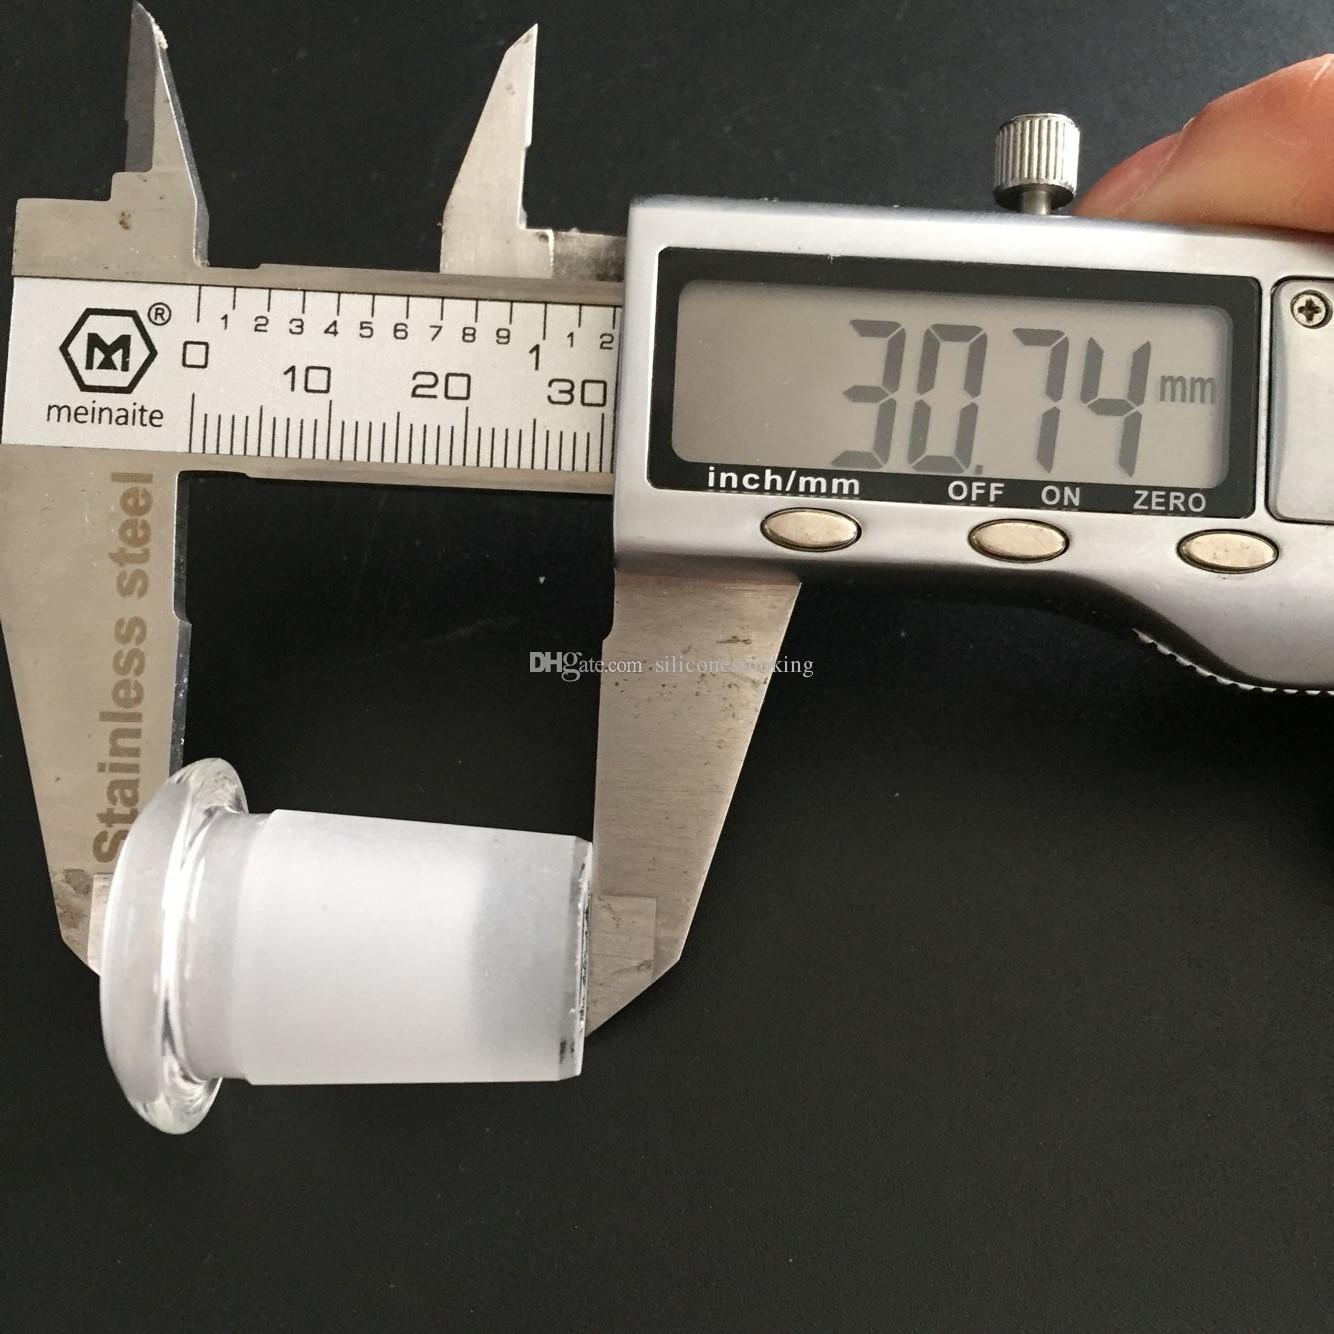 Mini adaptador de vidrio 10 mm hembra a 14 mm macho / 14 mm hembra a 18 mm macho forsted boca vidrio en el adaptador de vidrio envío gratuito